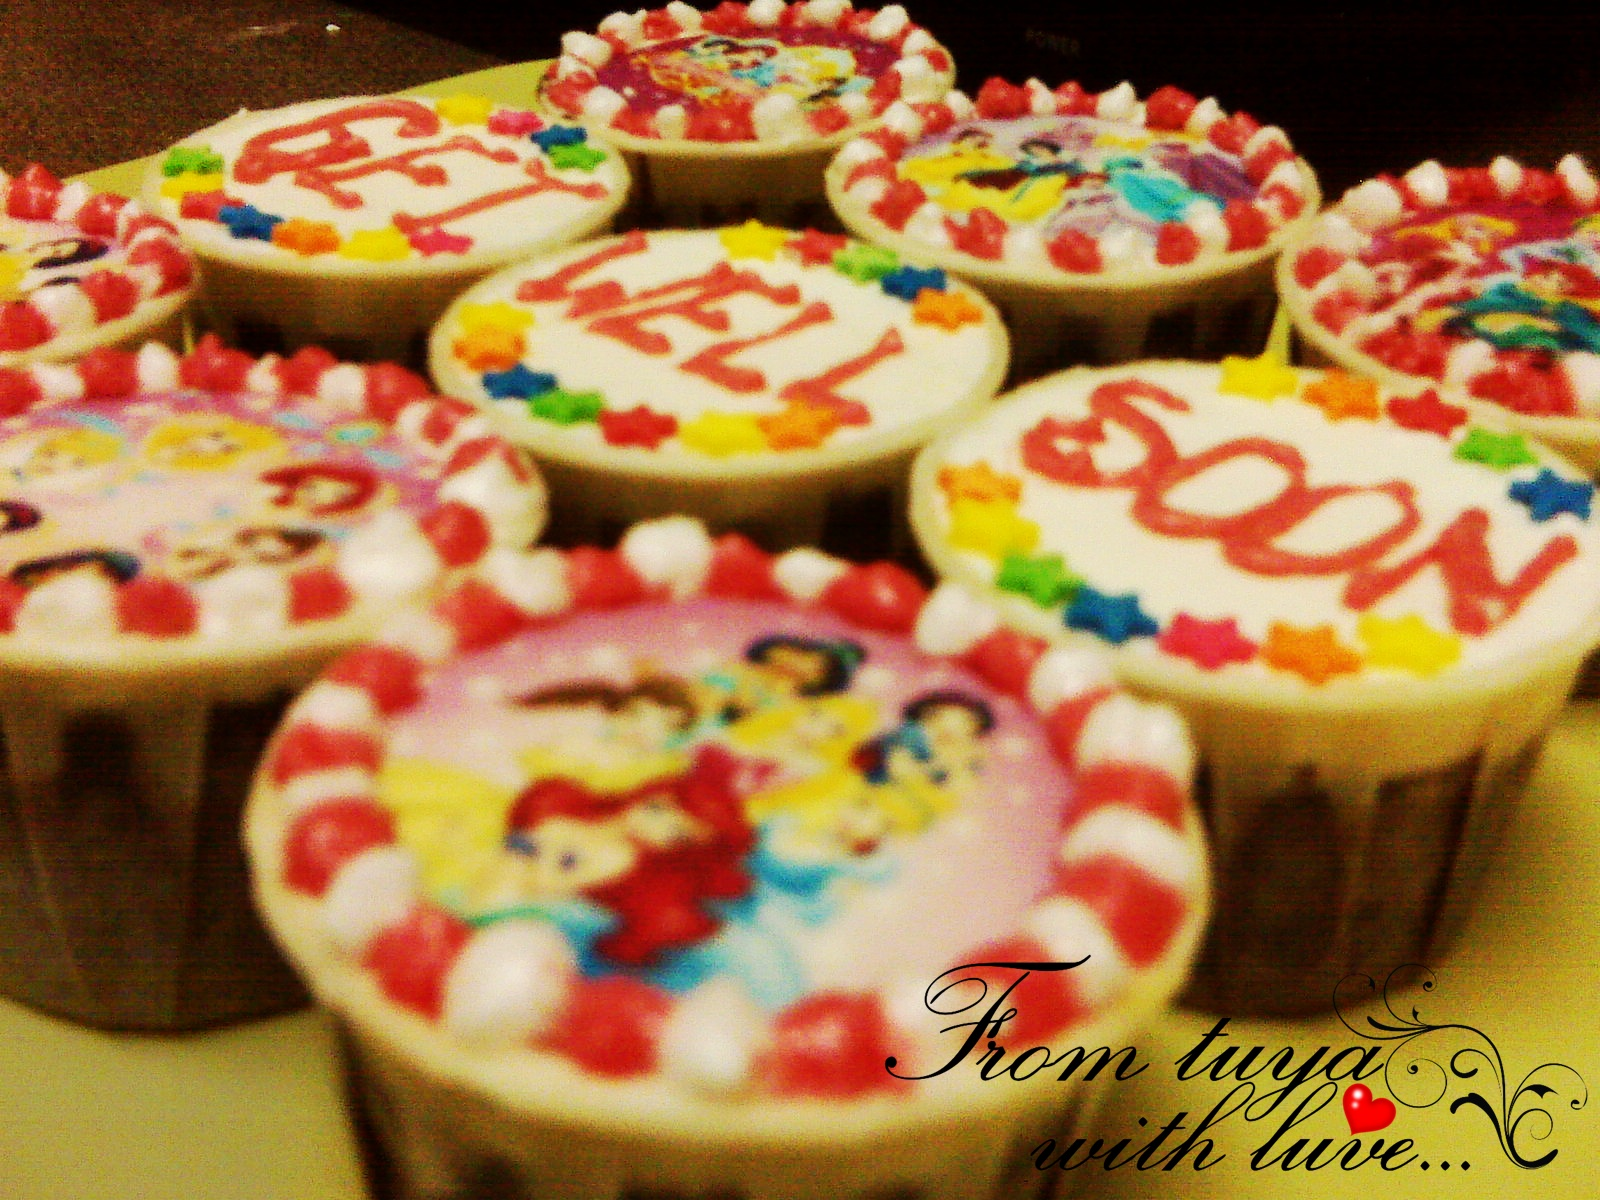 Cup Cake Coklat Kukus : Resep Cake Kukus Coklat tanpa Mixer oleh Herlina Sari / Tim coklat